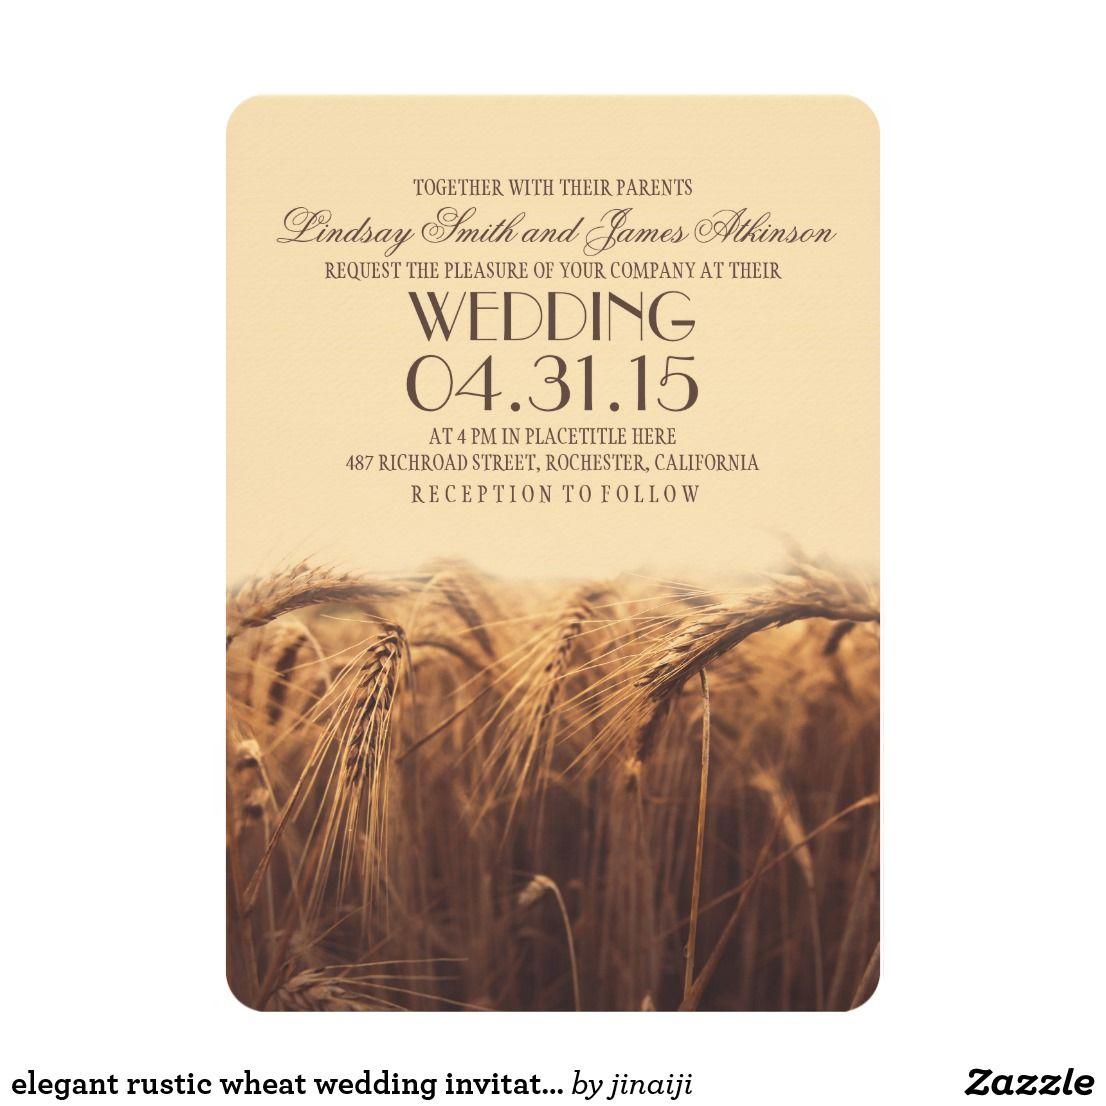 Elegant rustic wheat wedding invitations | Country fall, Summer ...